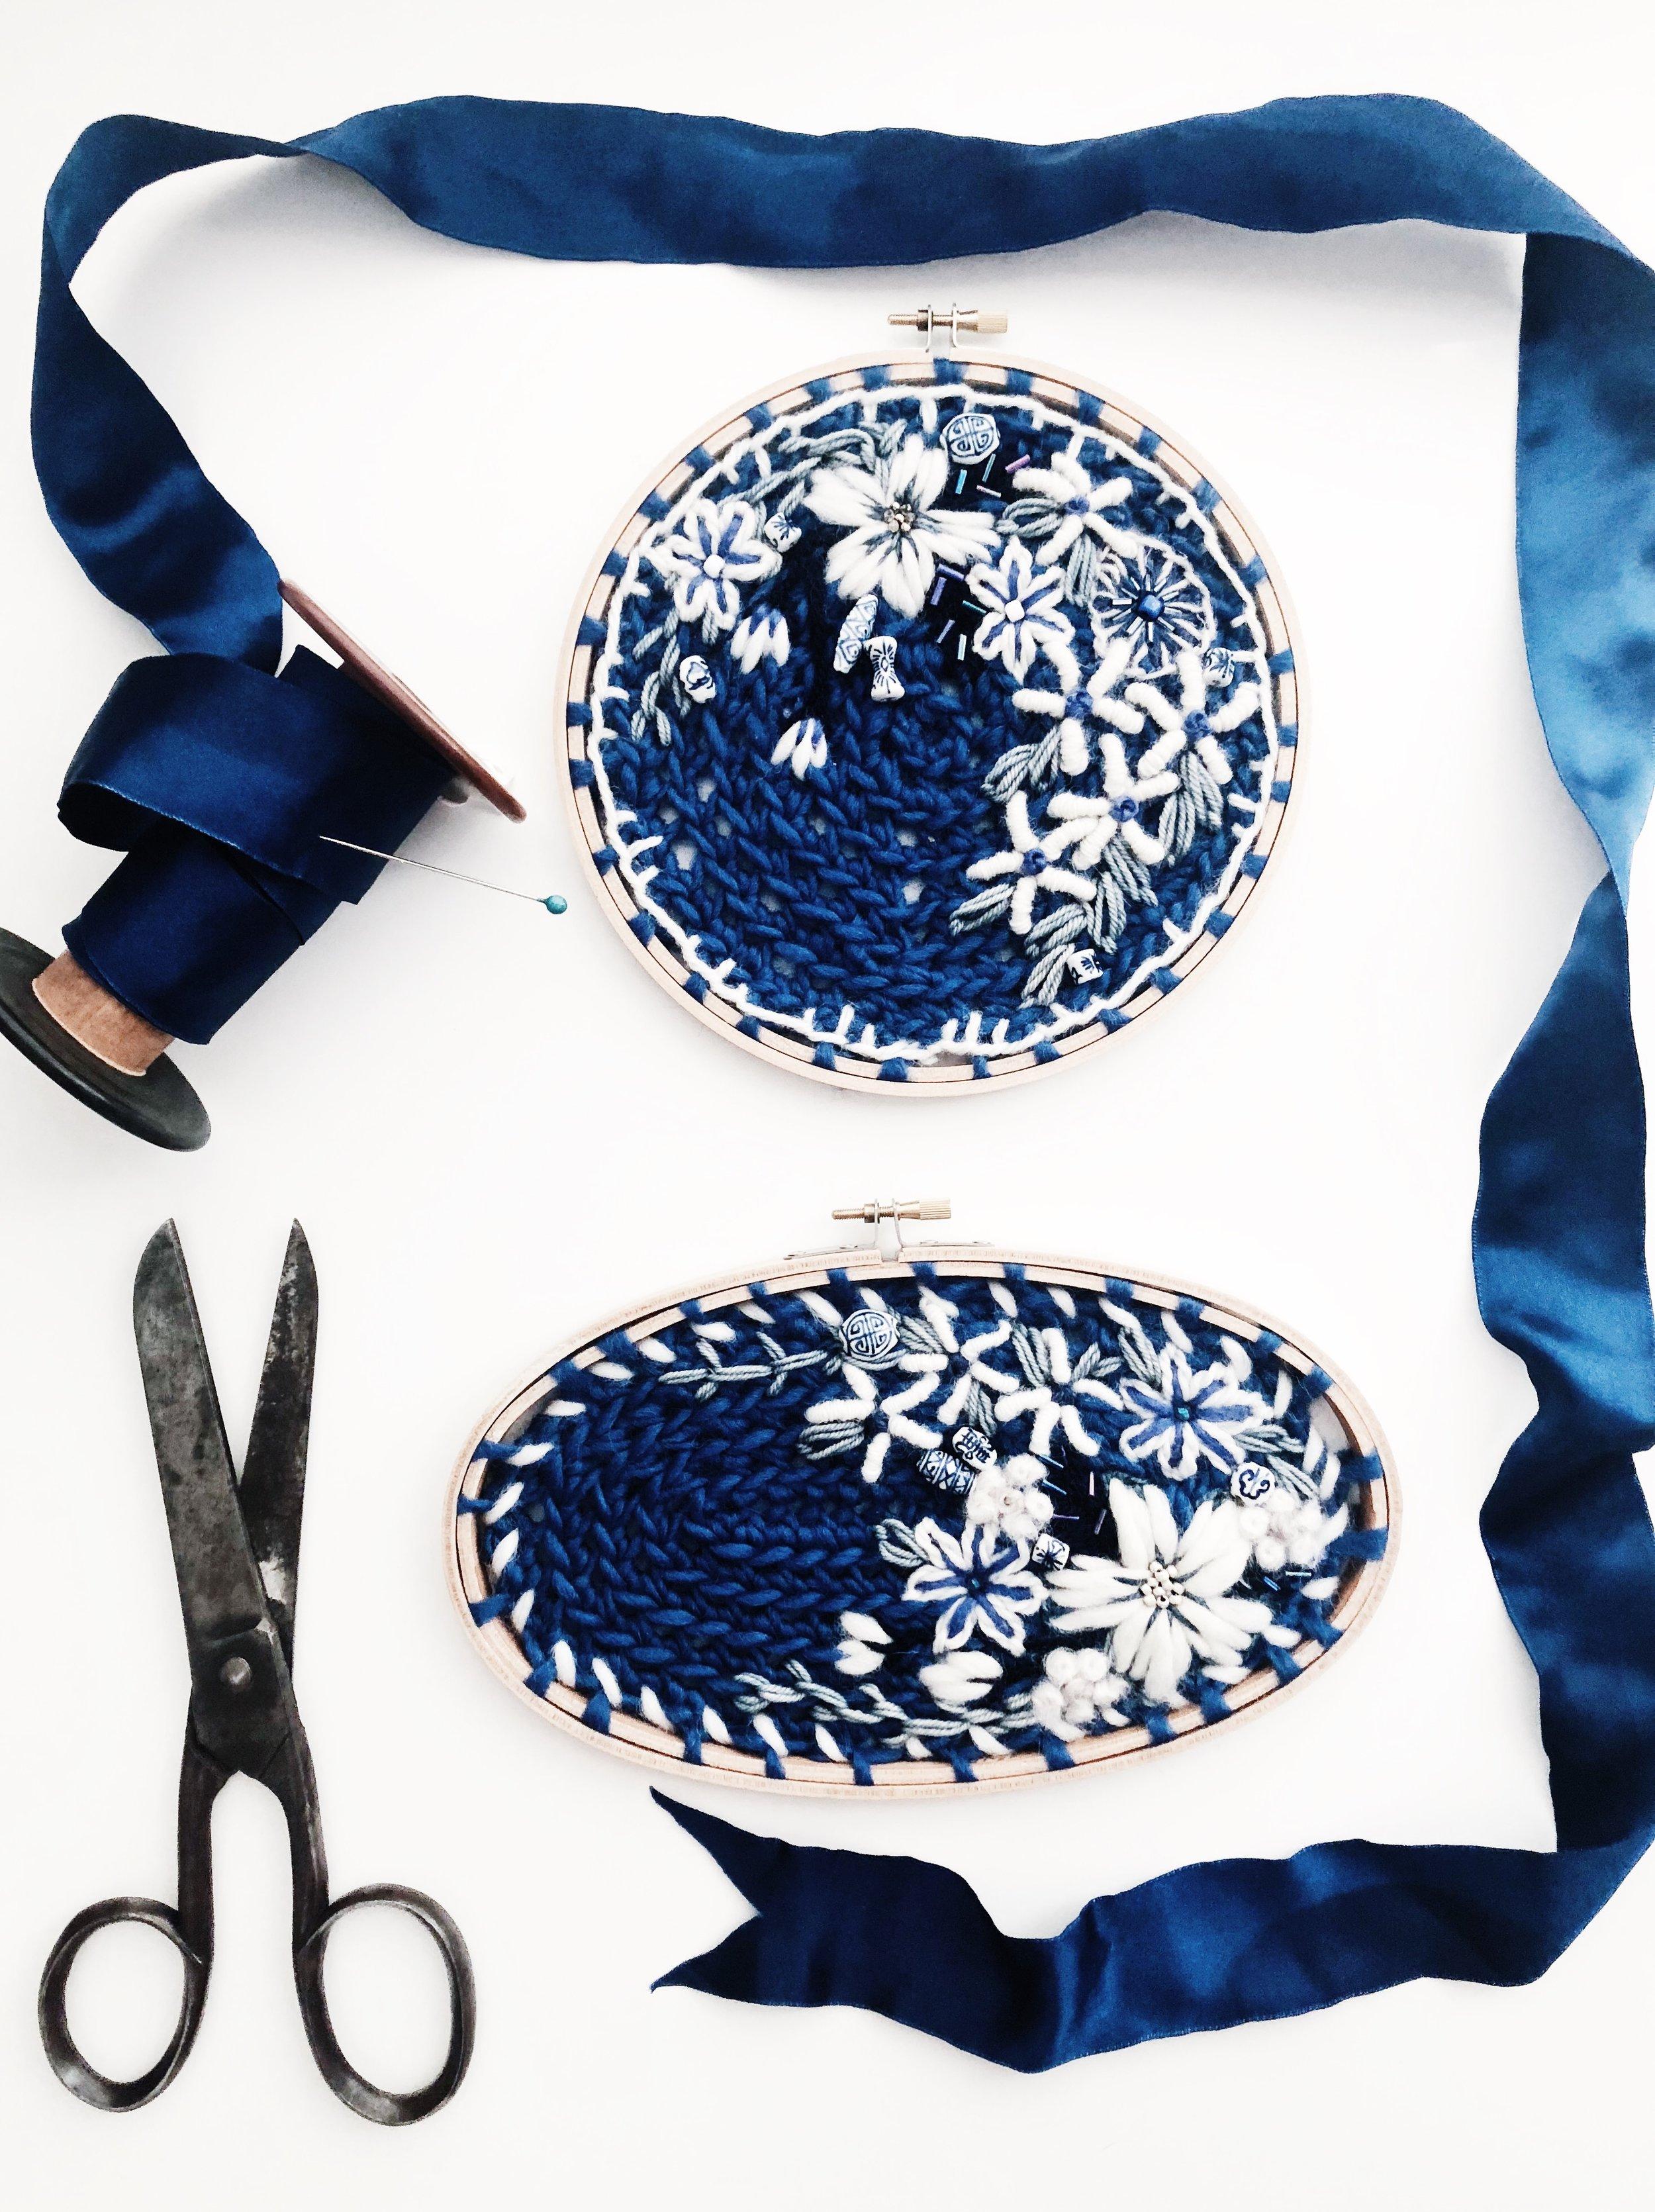 July p.jpgoandystudio.blue.delft.willow.embroidery.hoop.crewel.tapestry.crochet.pattern.flower.wall.hanging